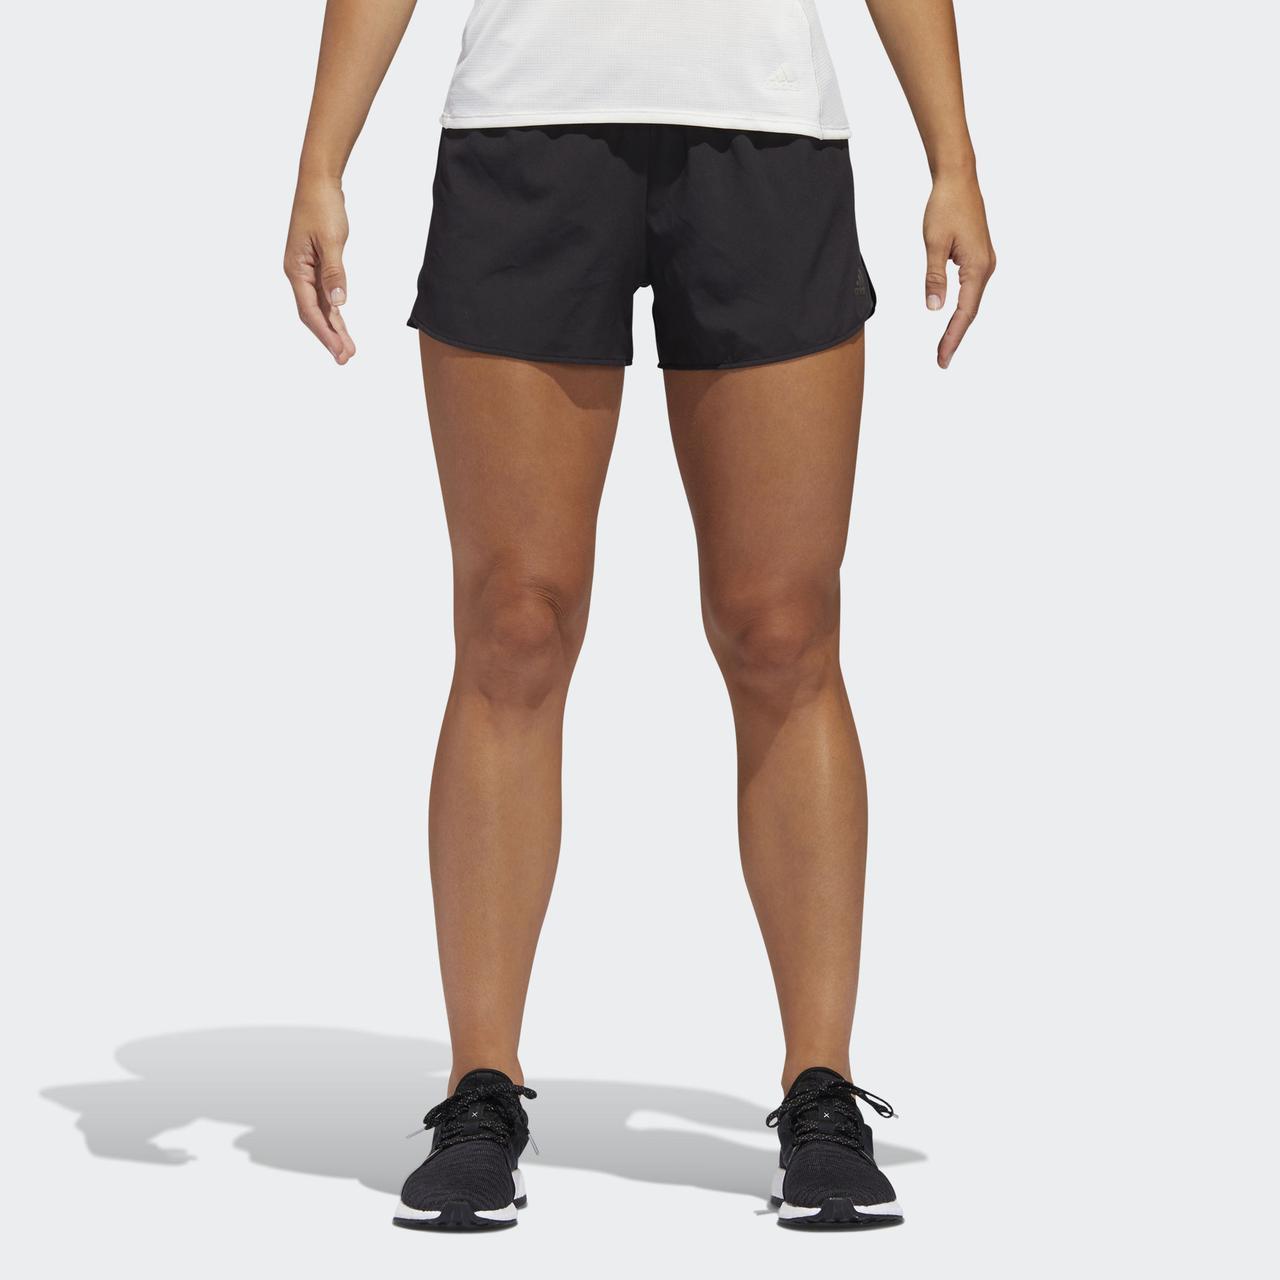 31eab80a44c1d Шорты женские Adidas Supernova Saturday W CY8362 - 2019 - Интернет магазин  Tip - все типы